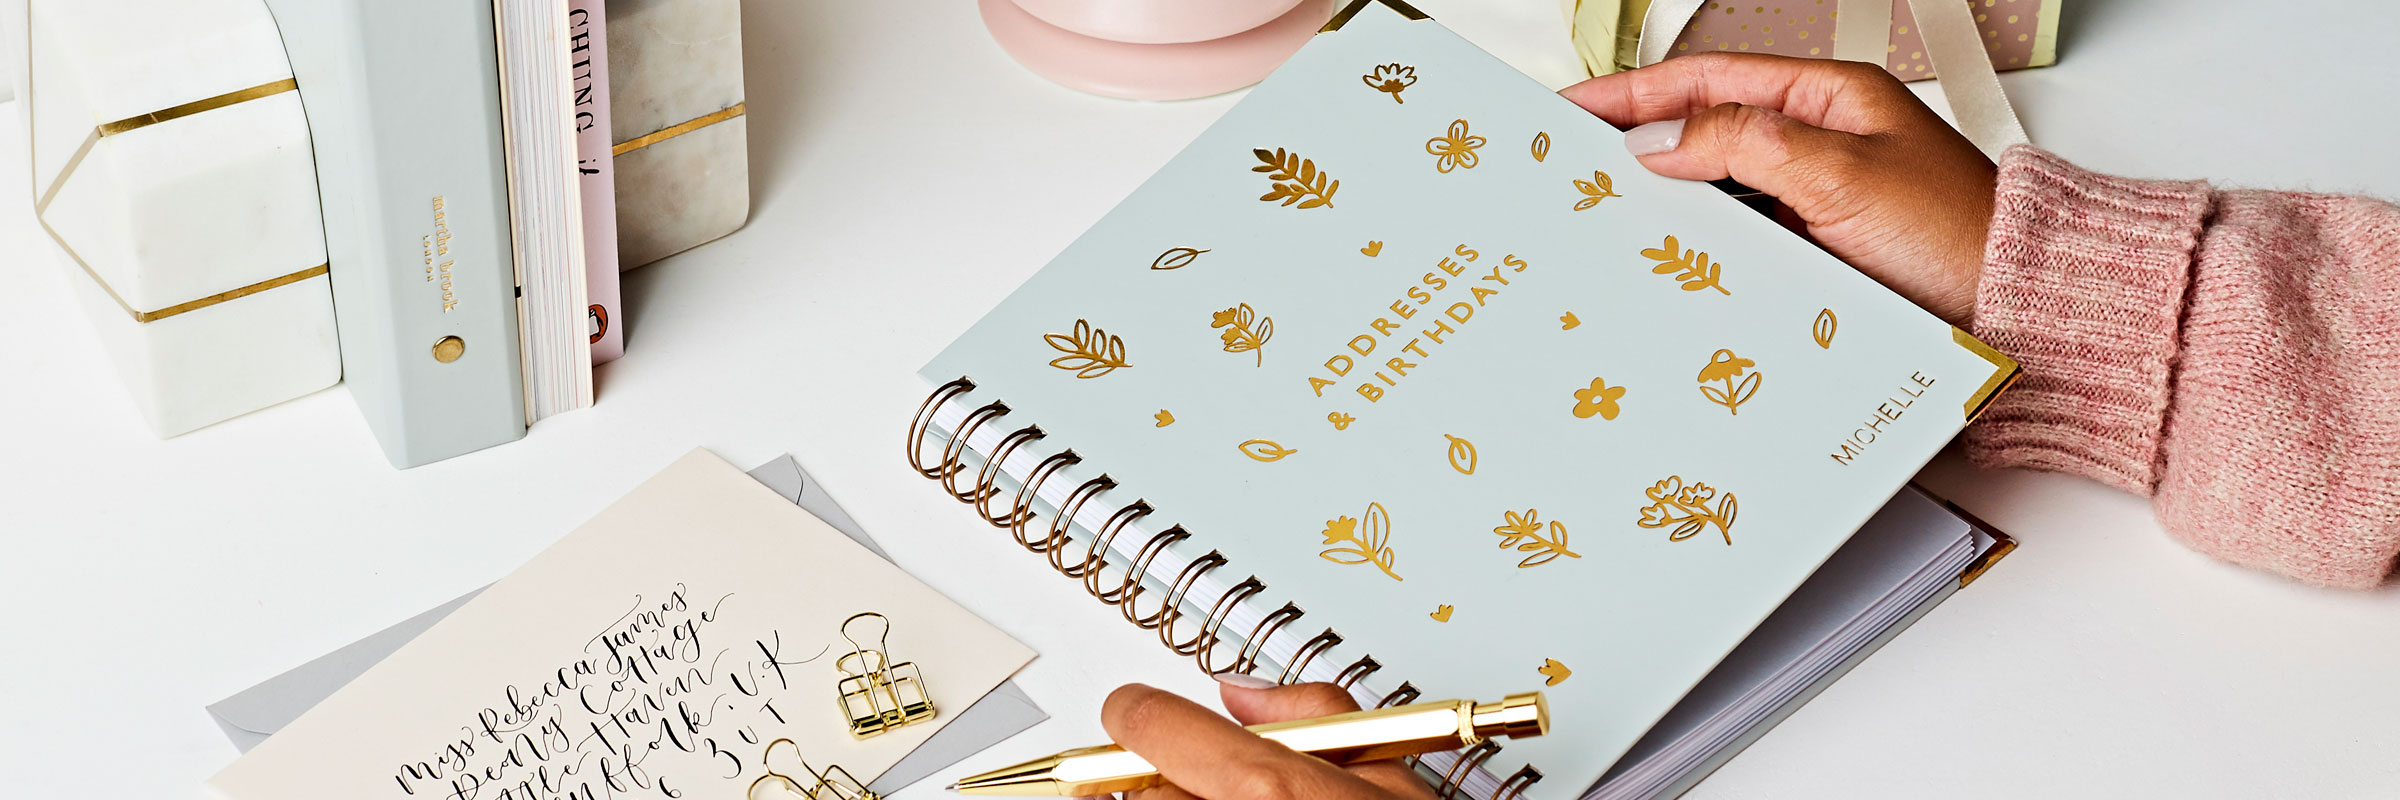 martha-brook-personalised-address-book